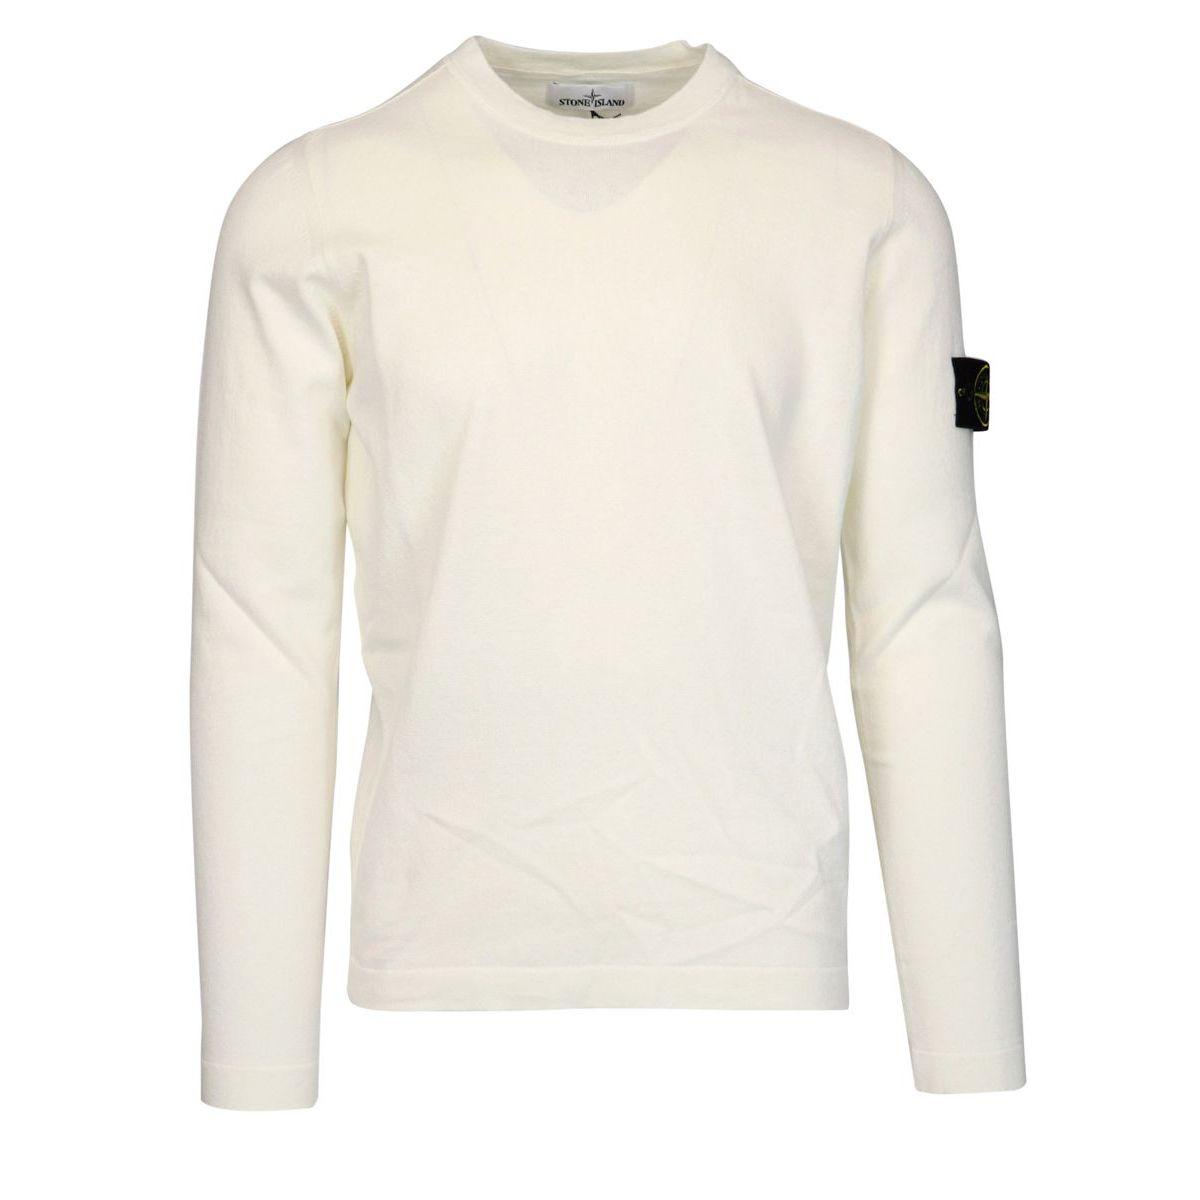 Crew neck cotton sweater with logo patch Ivory Stone Island